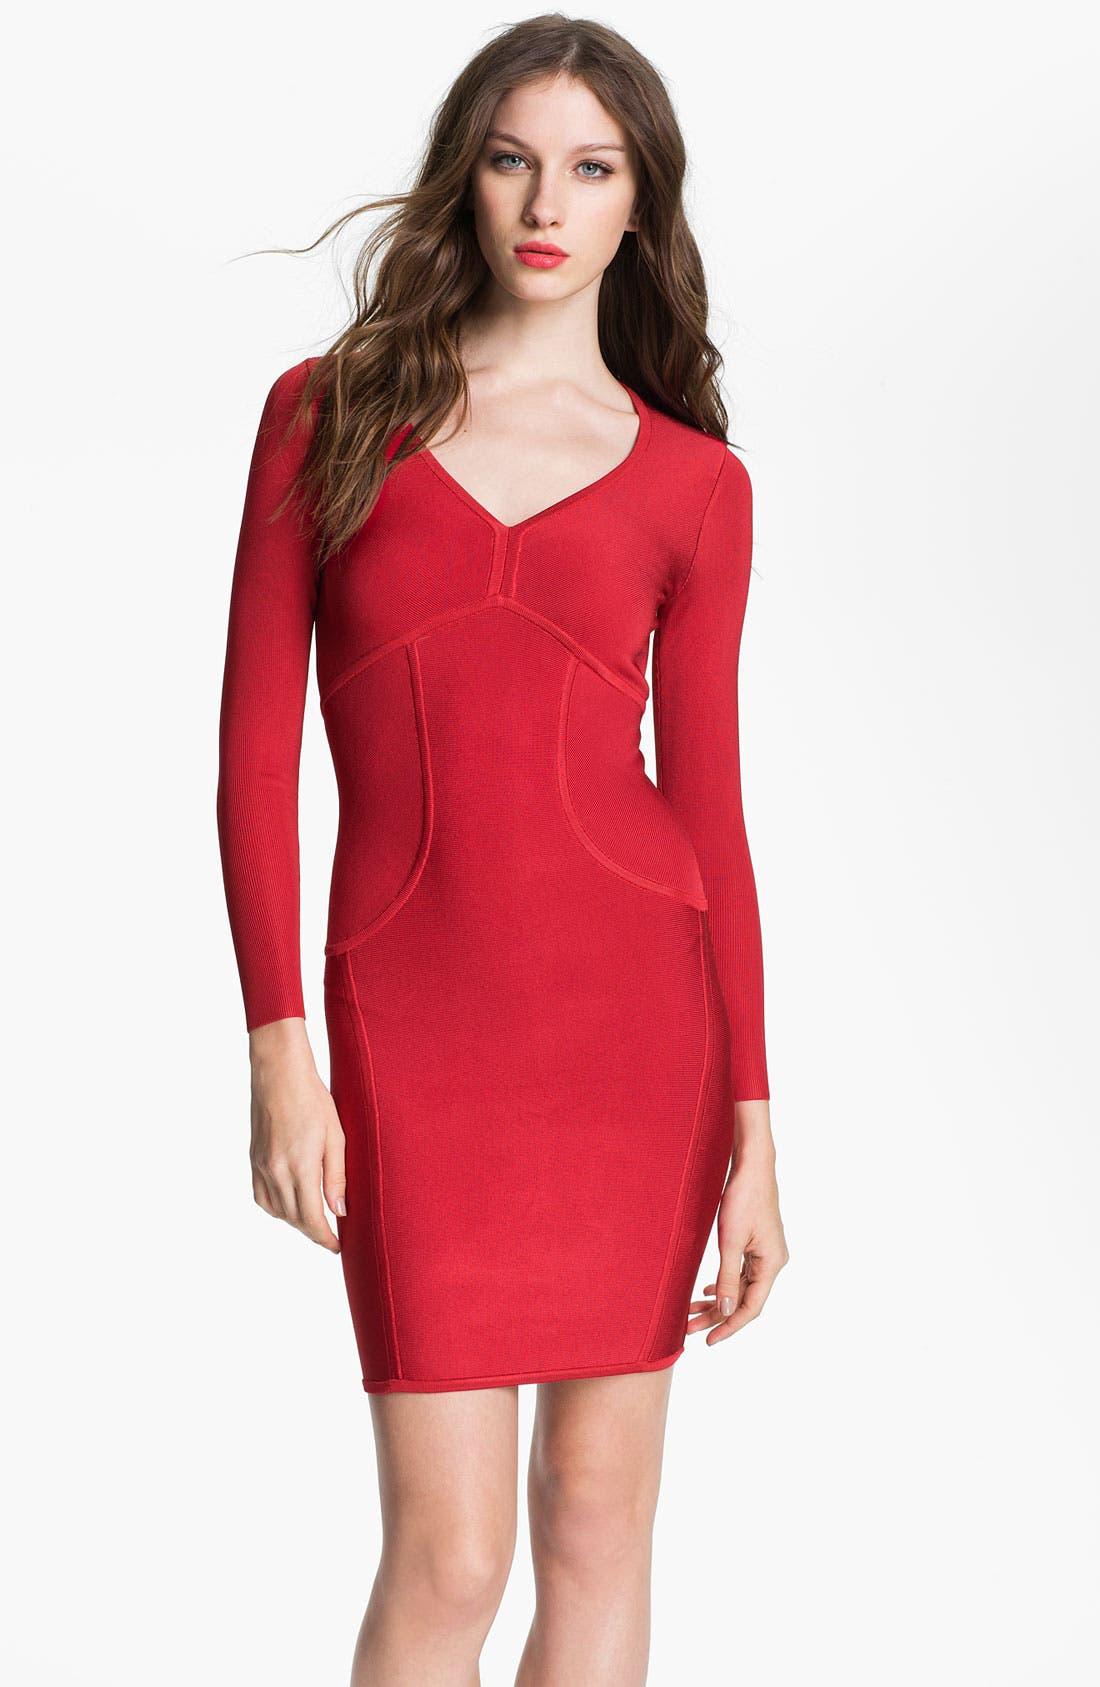 Alternate Image 1 Selected - Ted Baker London 'Aspin' Knit Sheath Dress